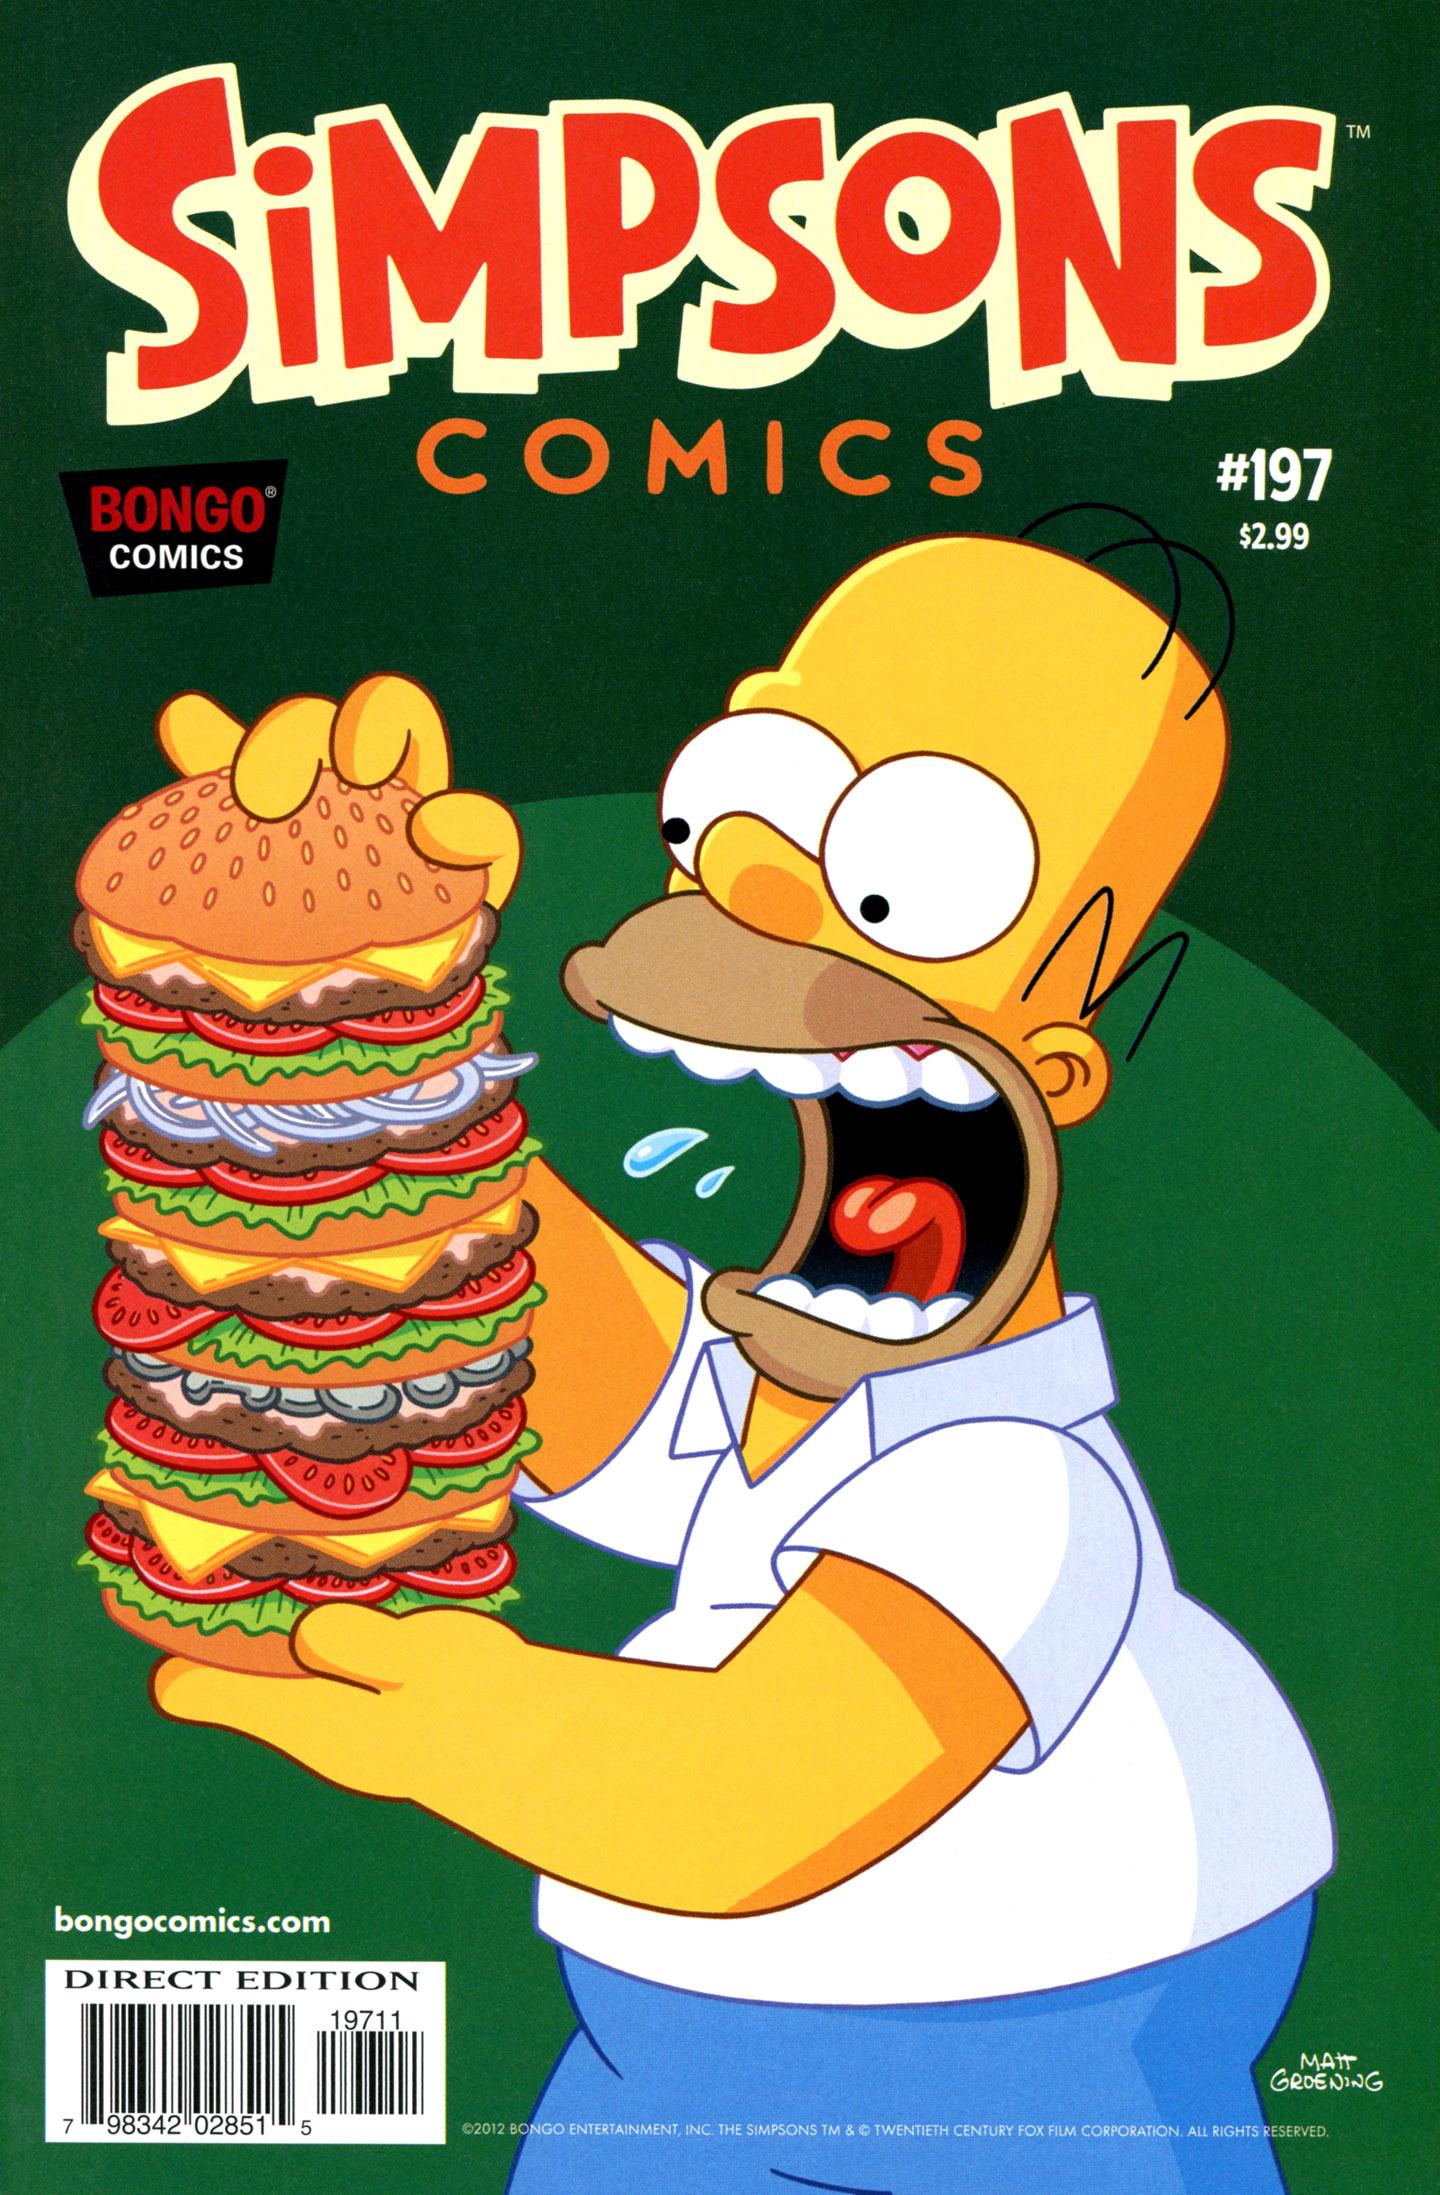 Simpsons Comics 197 Page 1